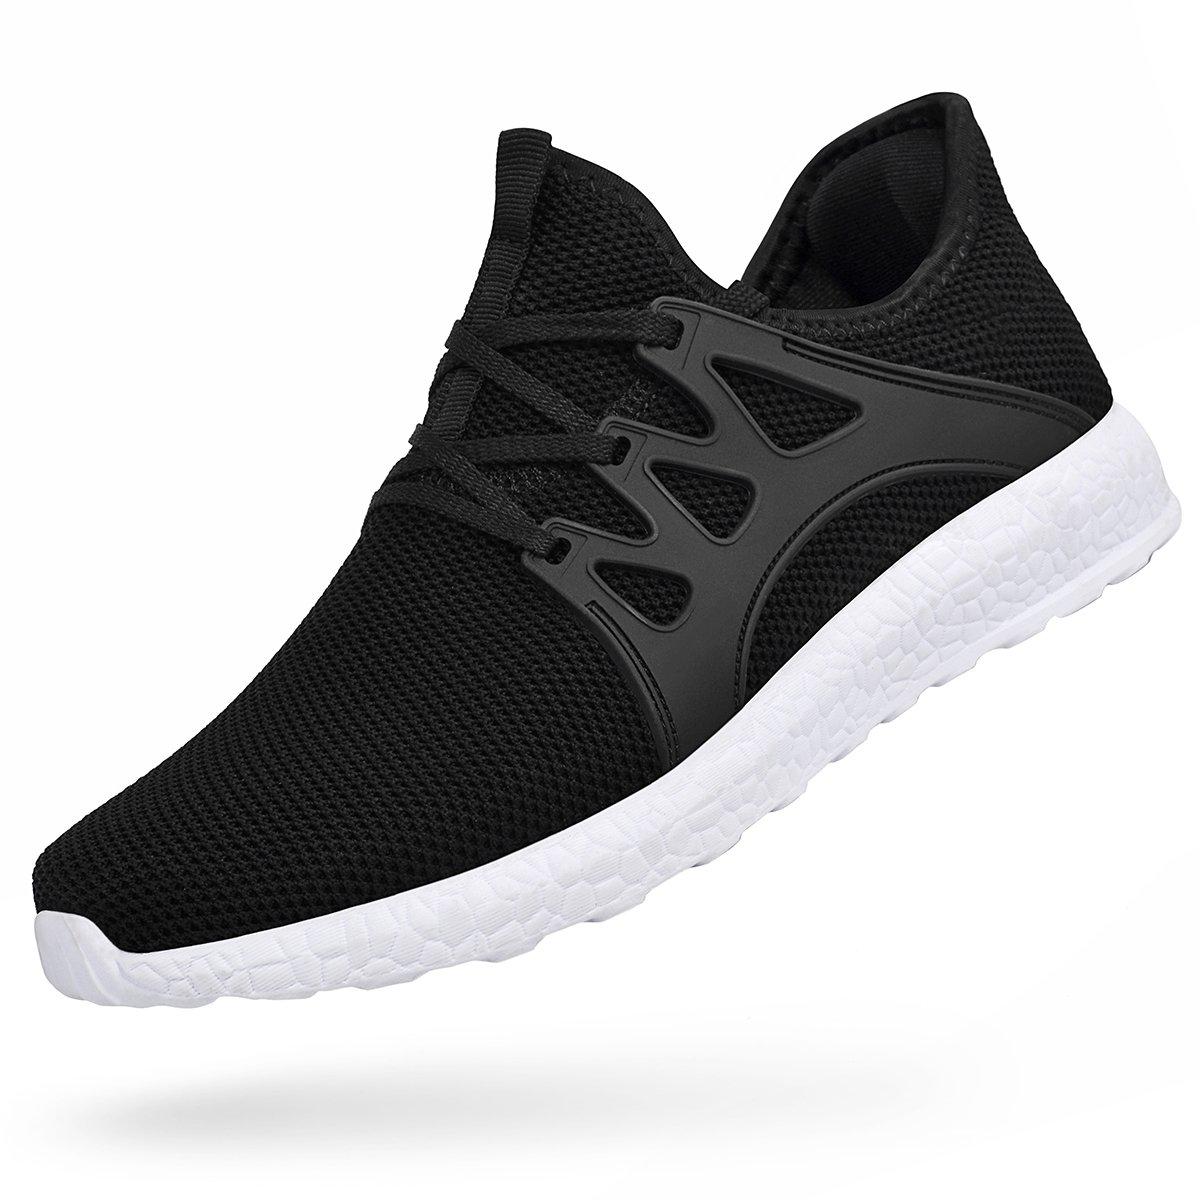 4170501ce5c24 Galleon - ZOCAVIA Sneakers For Women Lightweight Mesh Tennis Gym ...